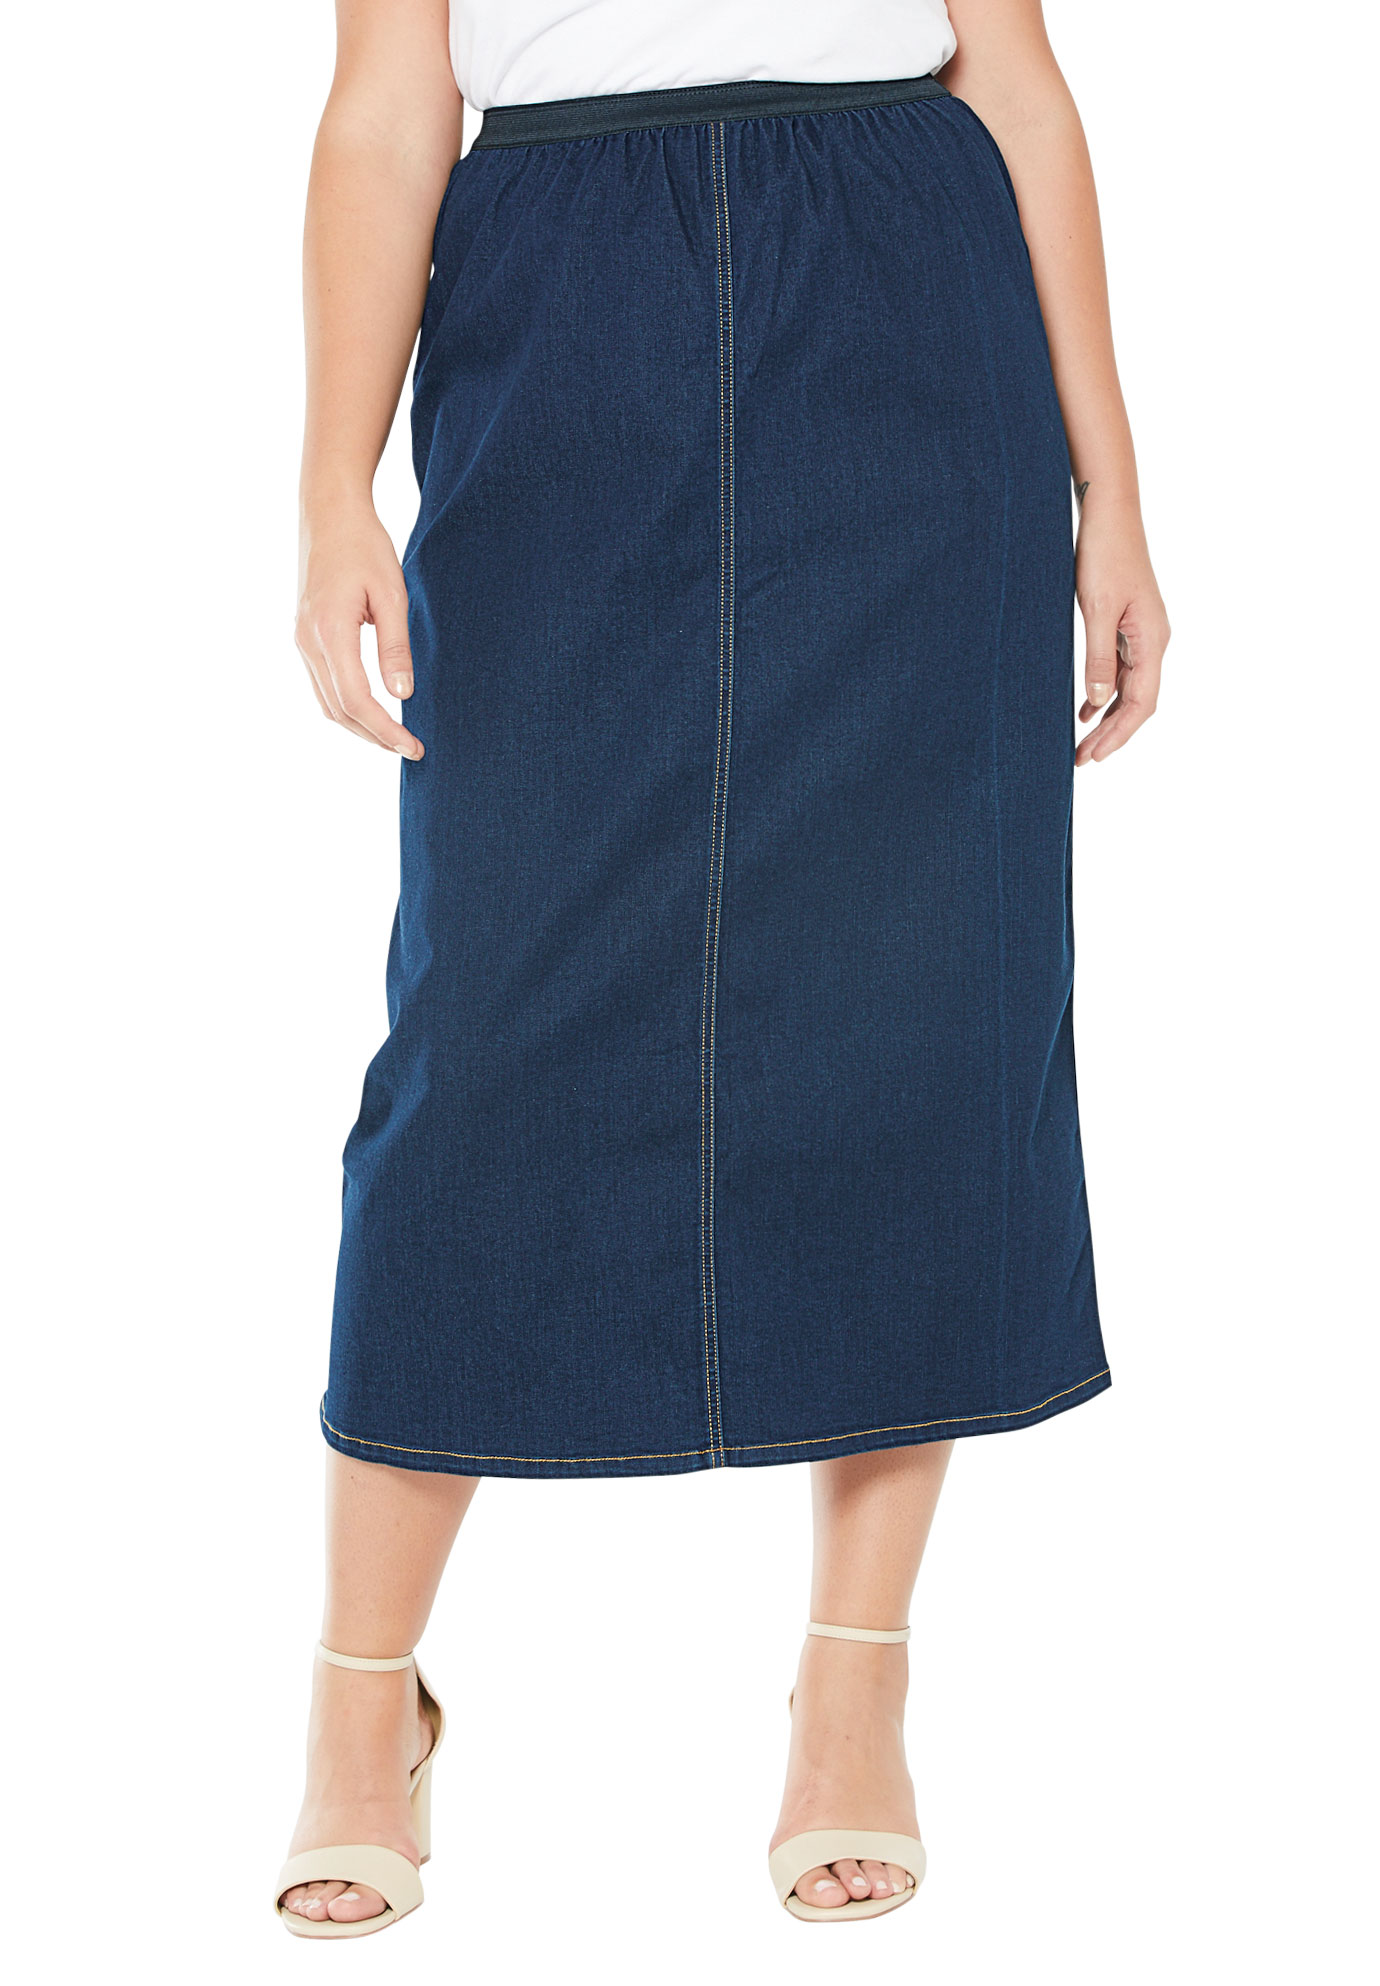 bea633fcb2376 A-Line Jegging Skirt